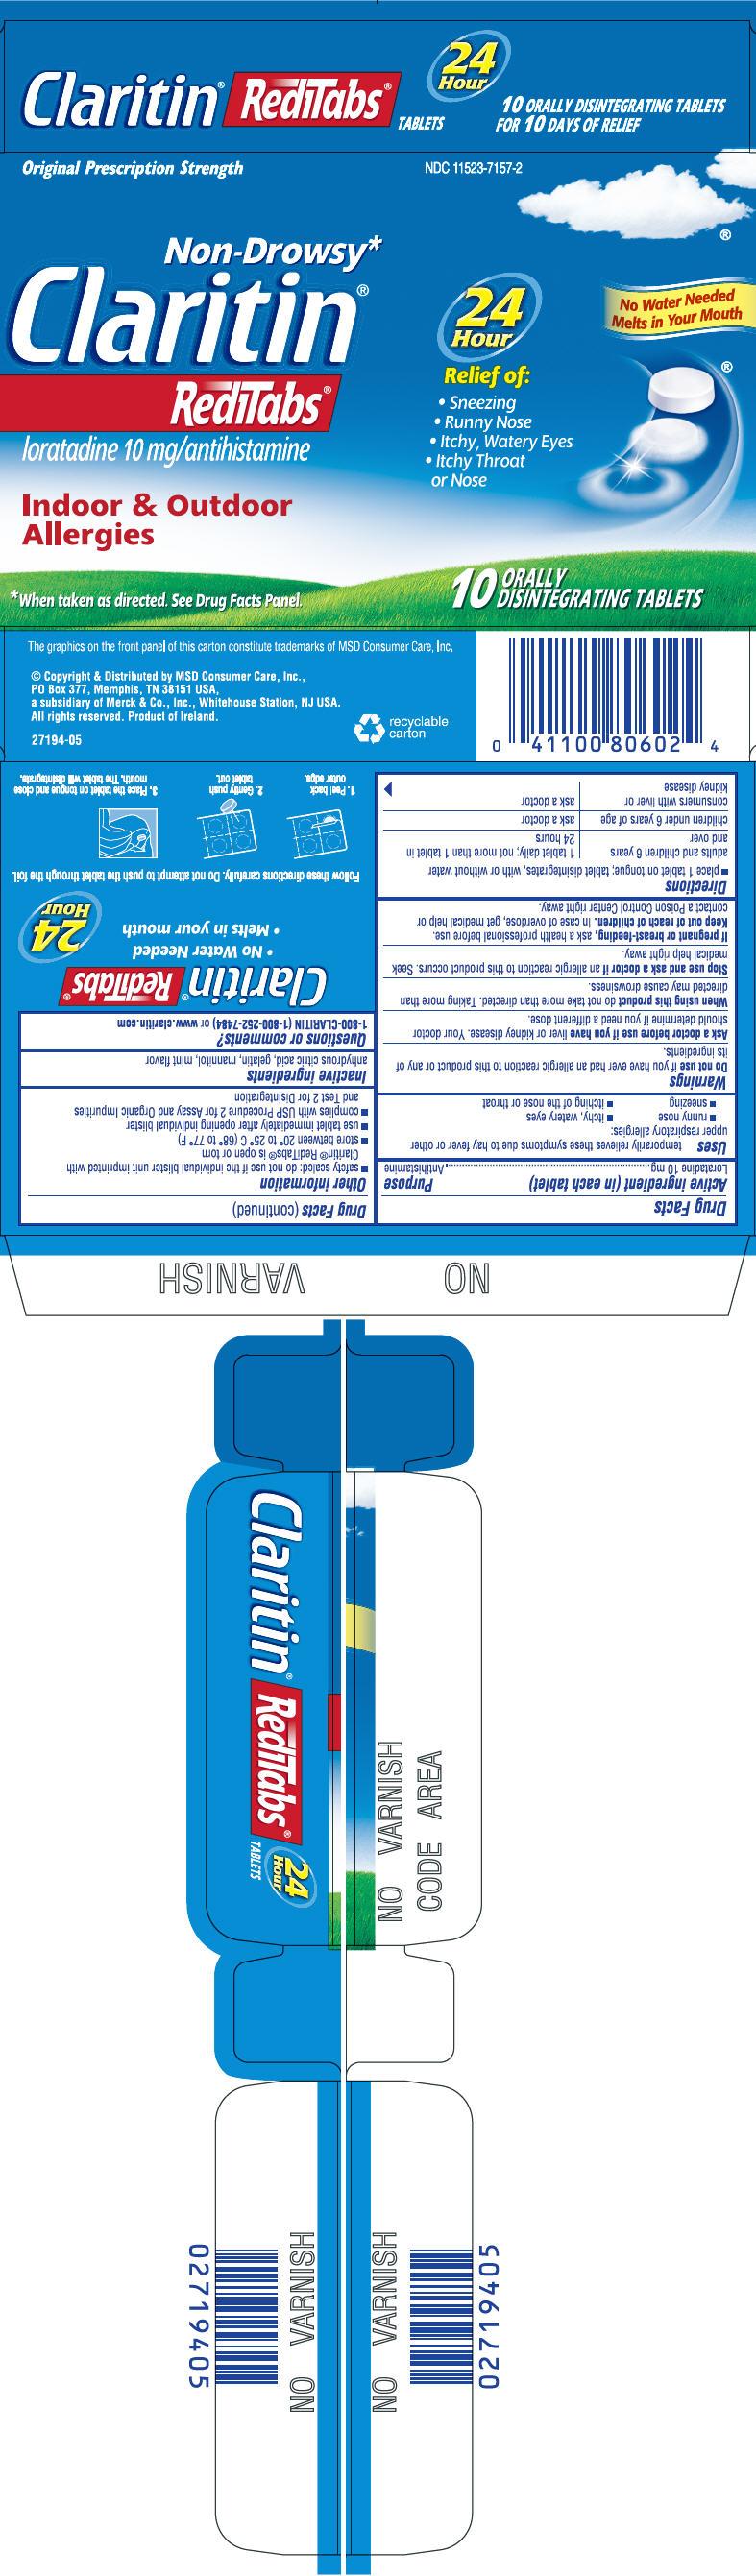 Claritin Reditabs (Loratadine) Tablet, Orally Disintegrating [Msd Consumer Care, Inc.]